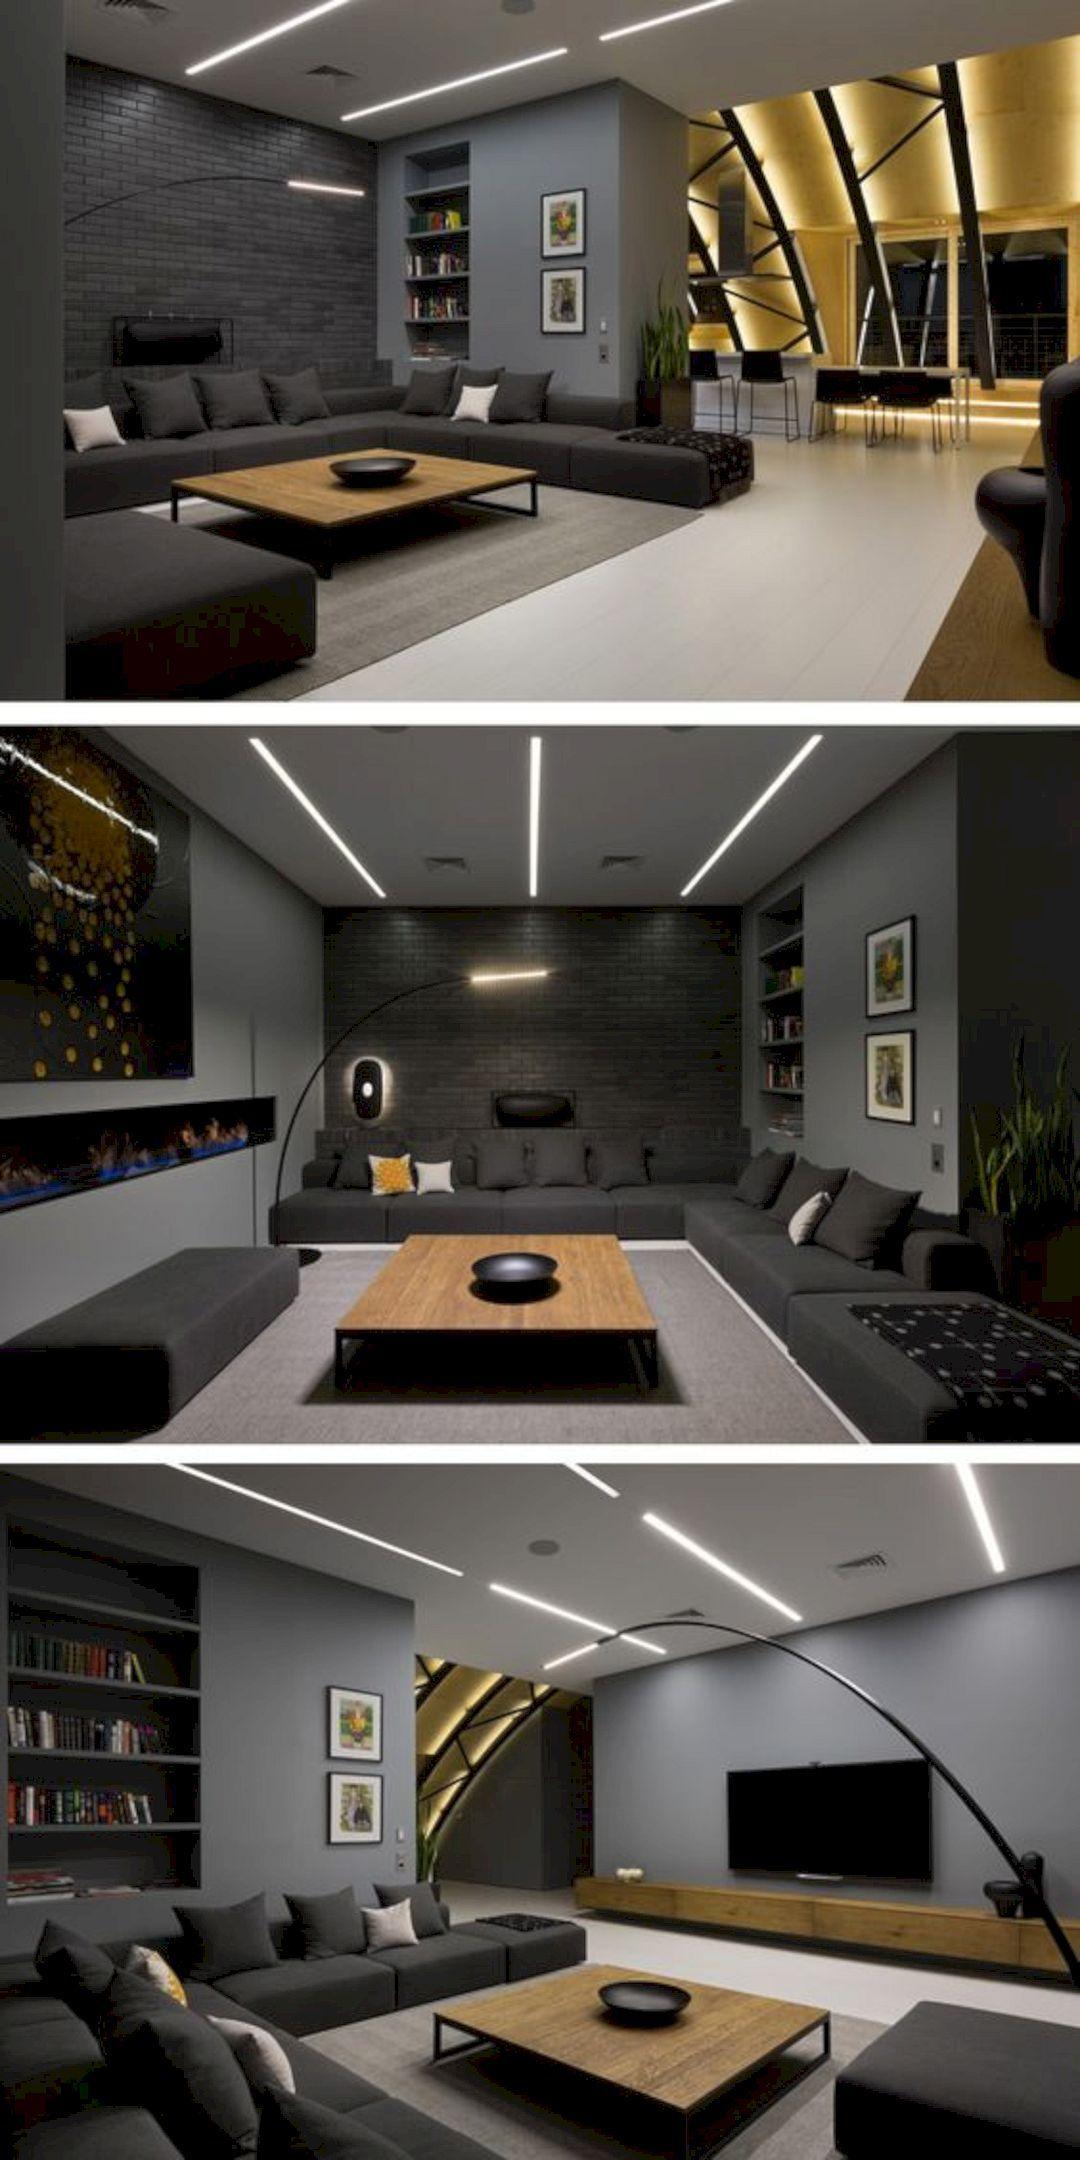 7 Home Décor Ideas for Your Living Room